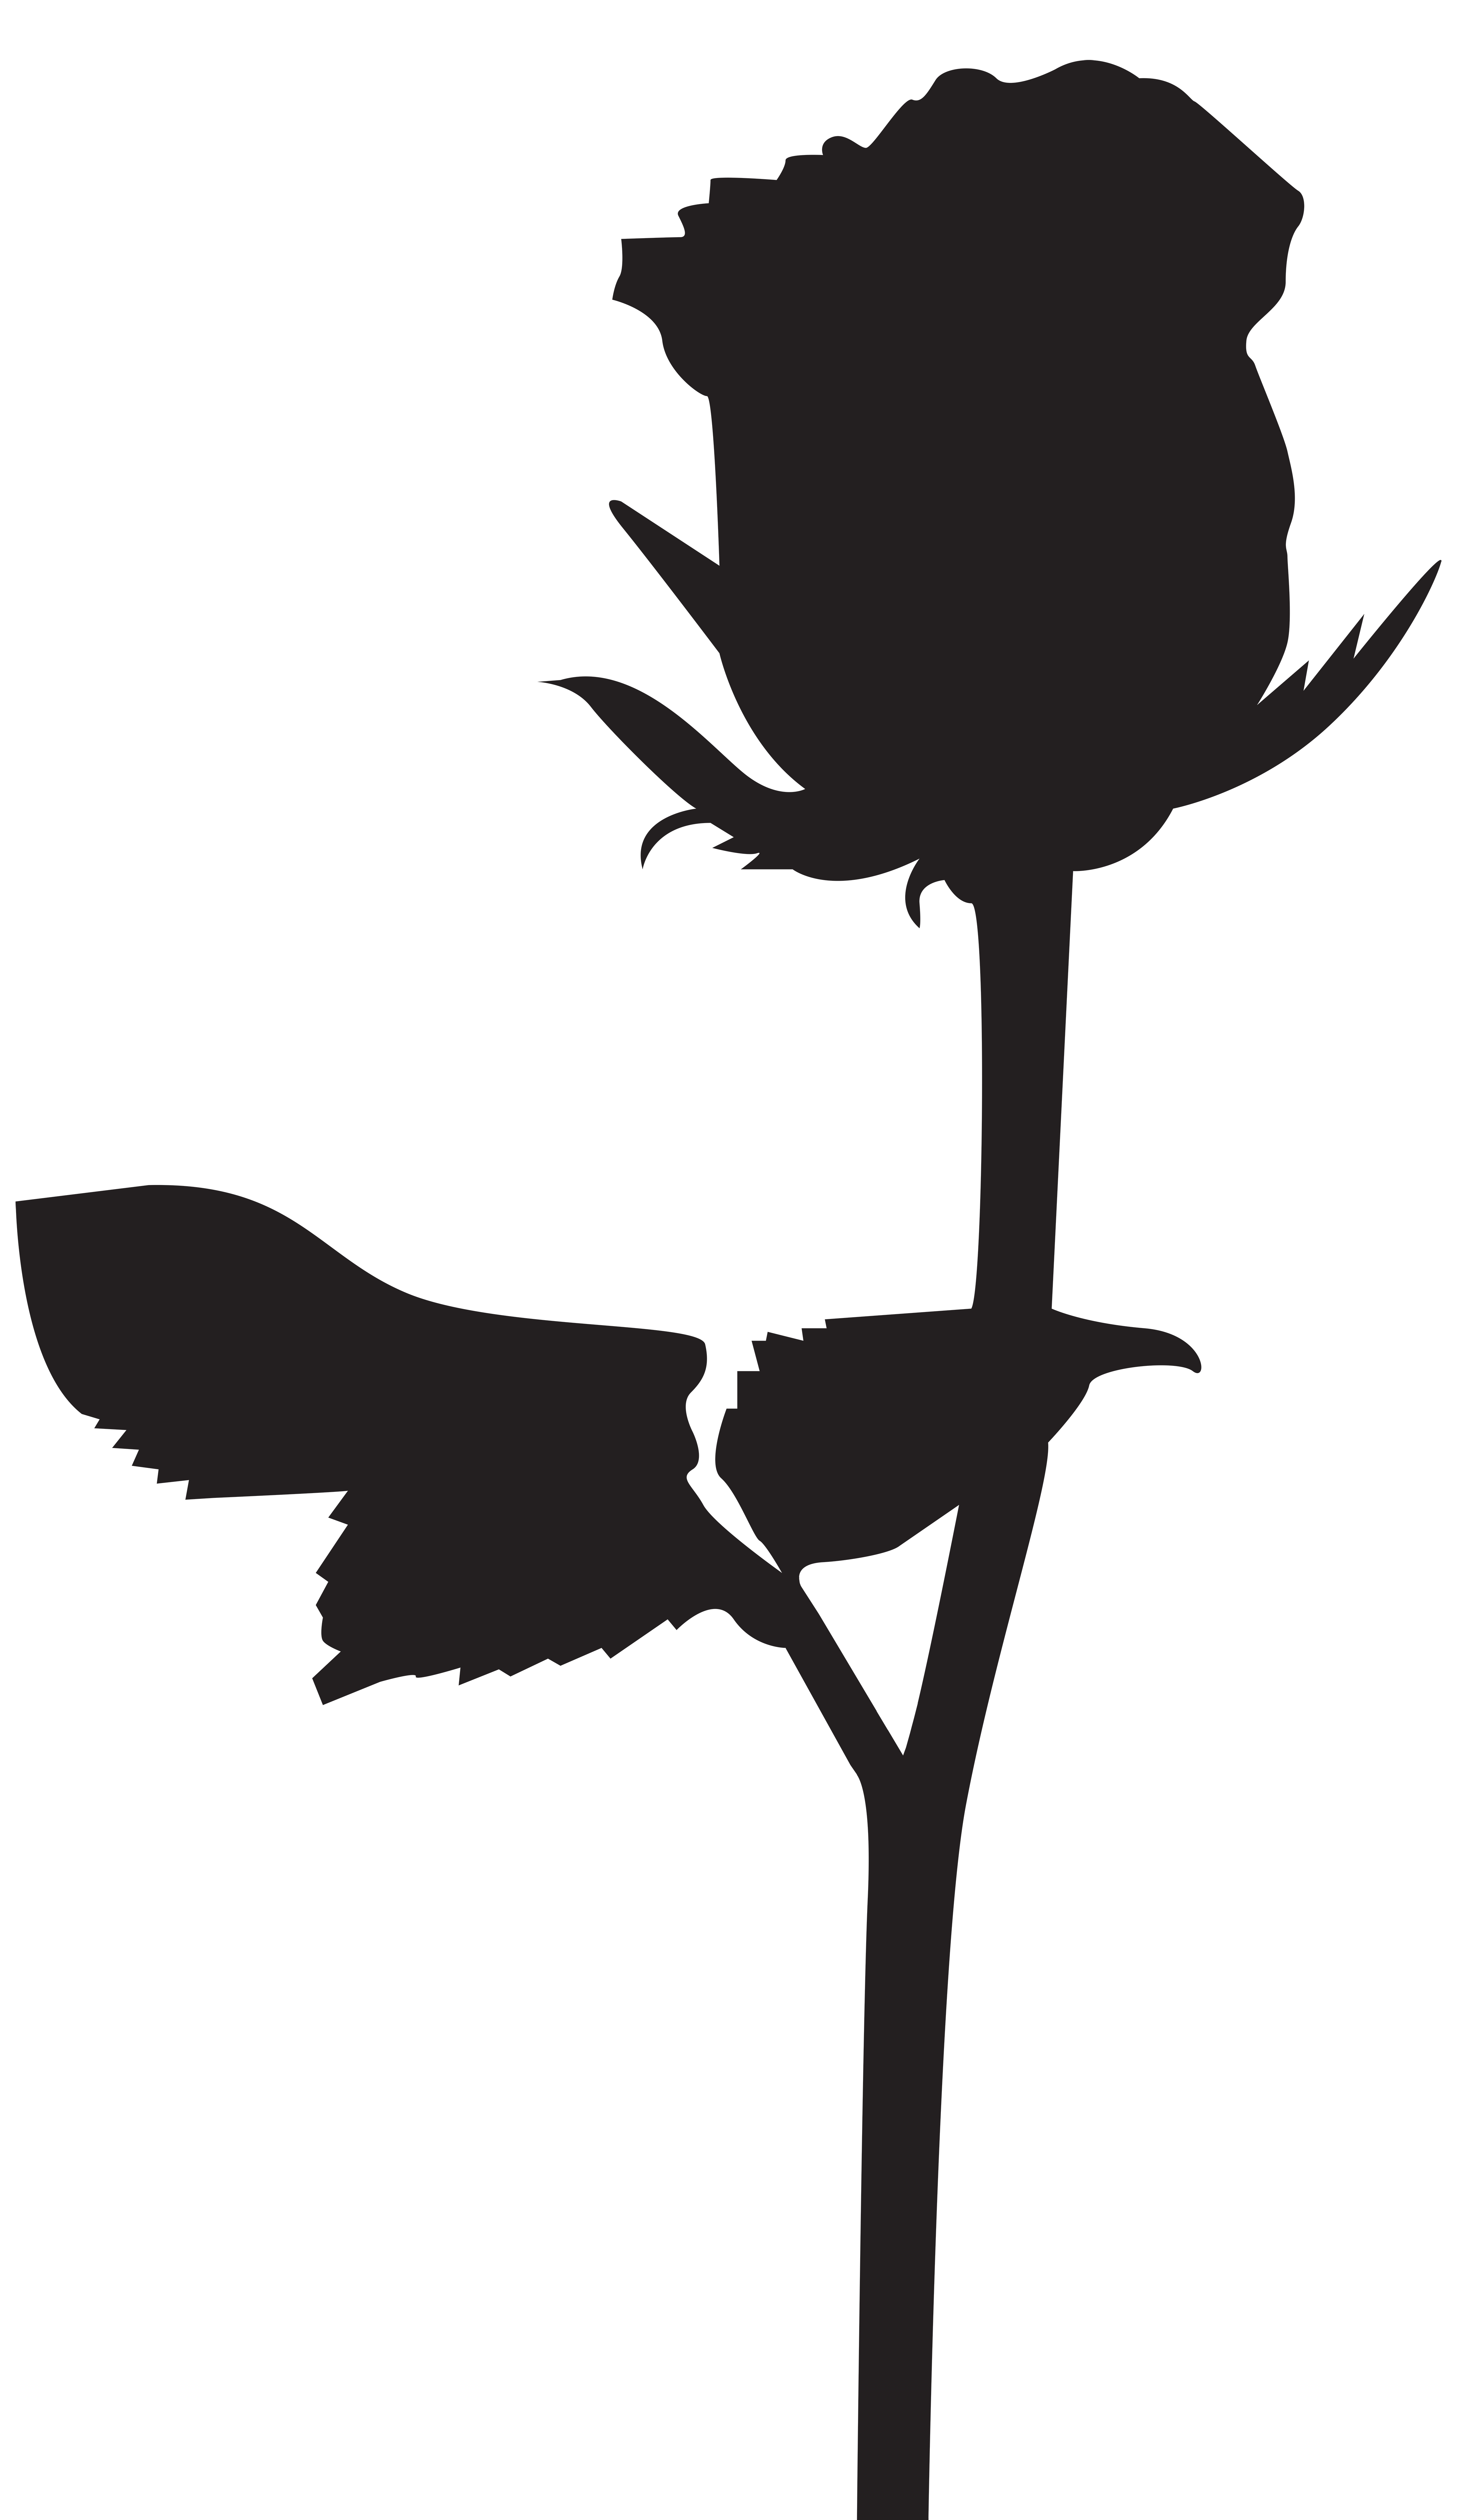 4624x8000 Rose Silhouette Png Transparent Clip Art Imageu200b Gallery